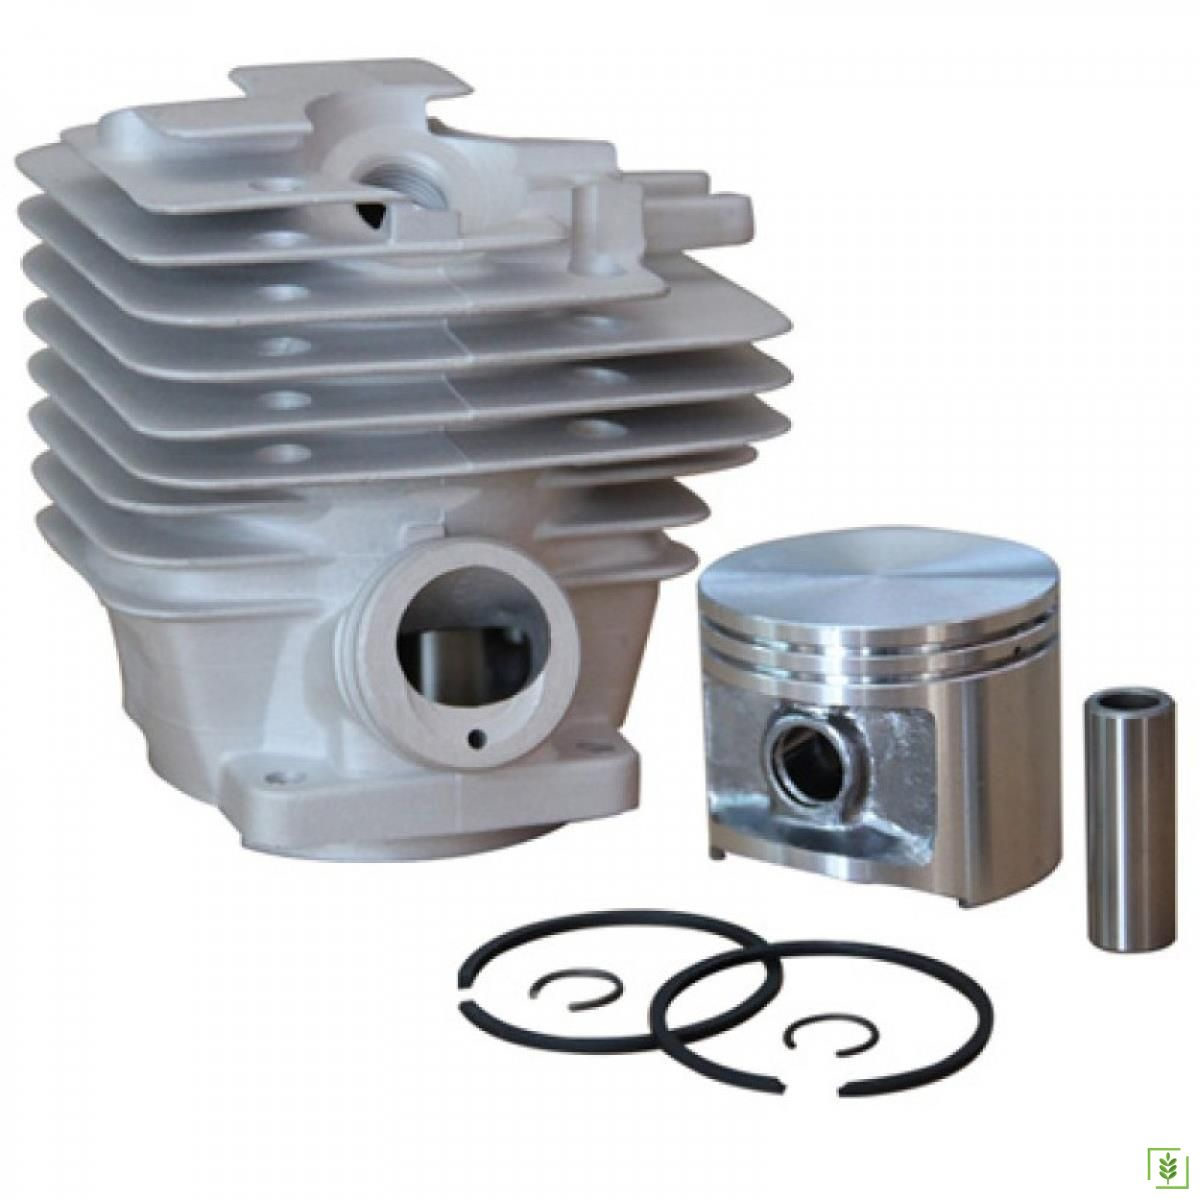 Baco CG - BG 3.1 HP Motorlu Tırpan Silindir Piston Seti